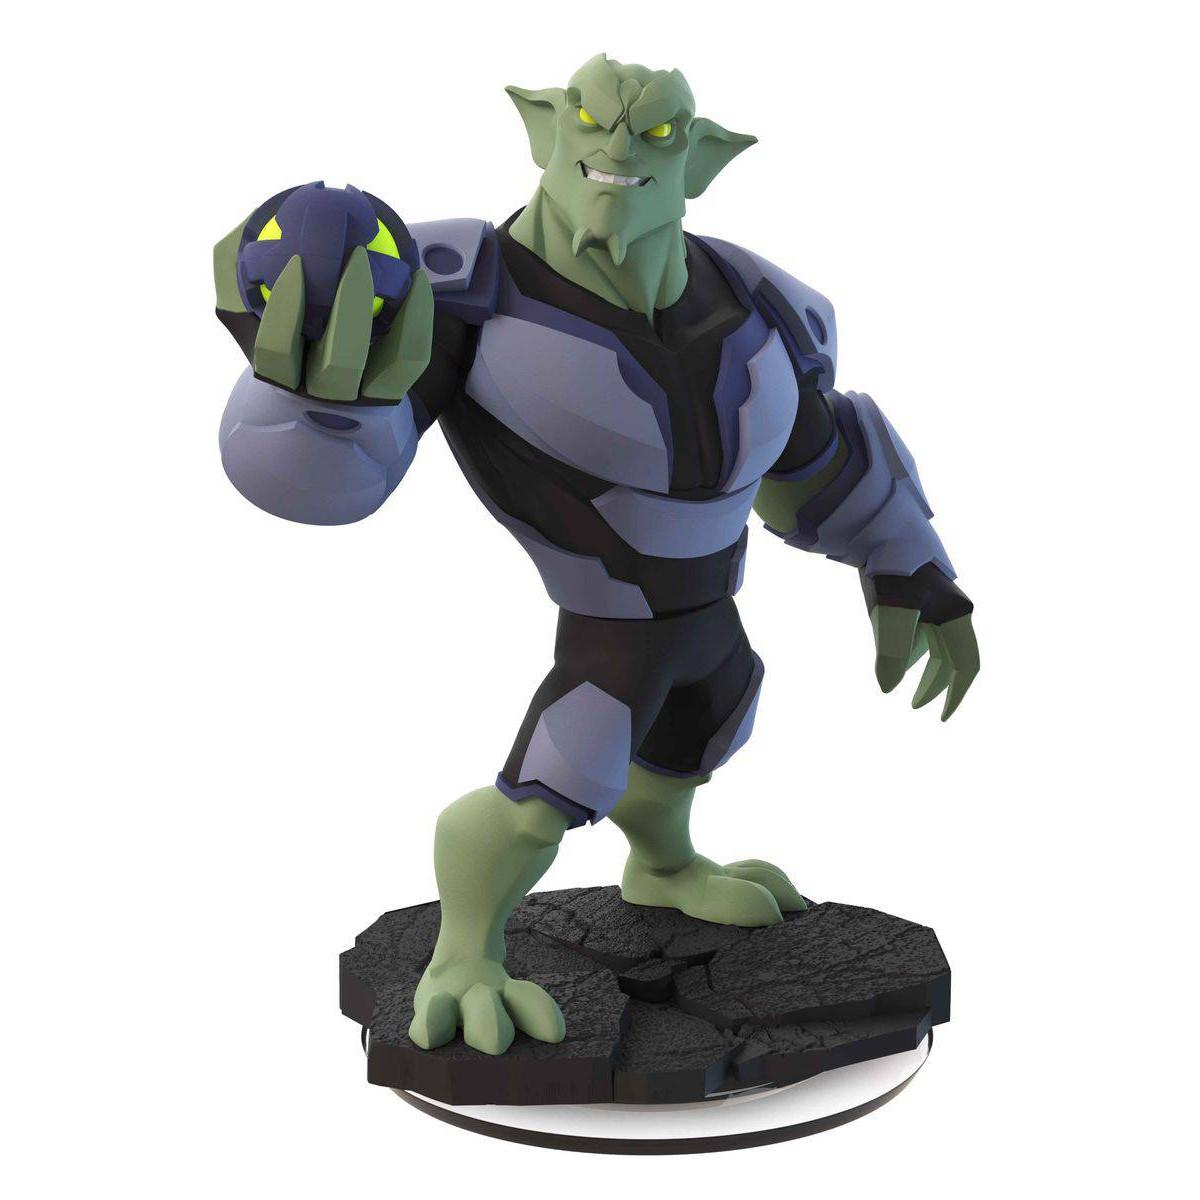 Disney Infinity 2.0 - Green Goblin játékfigura